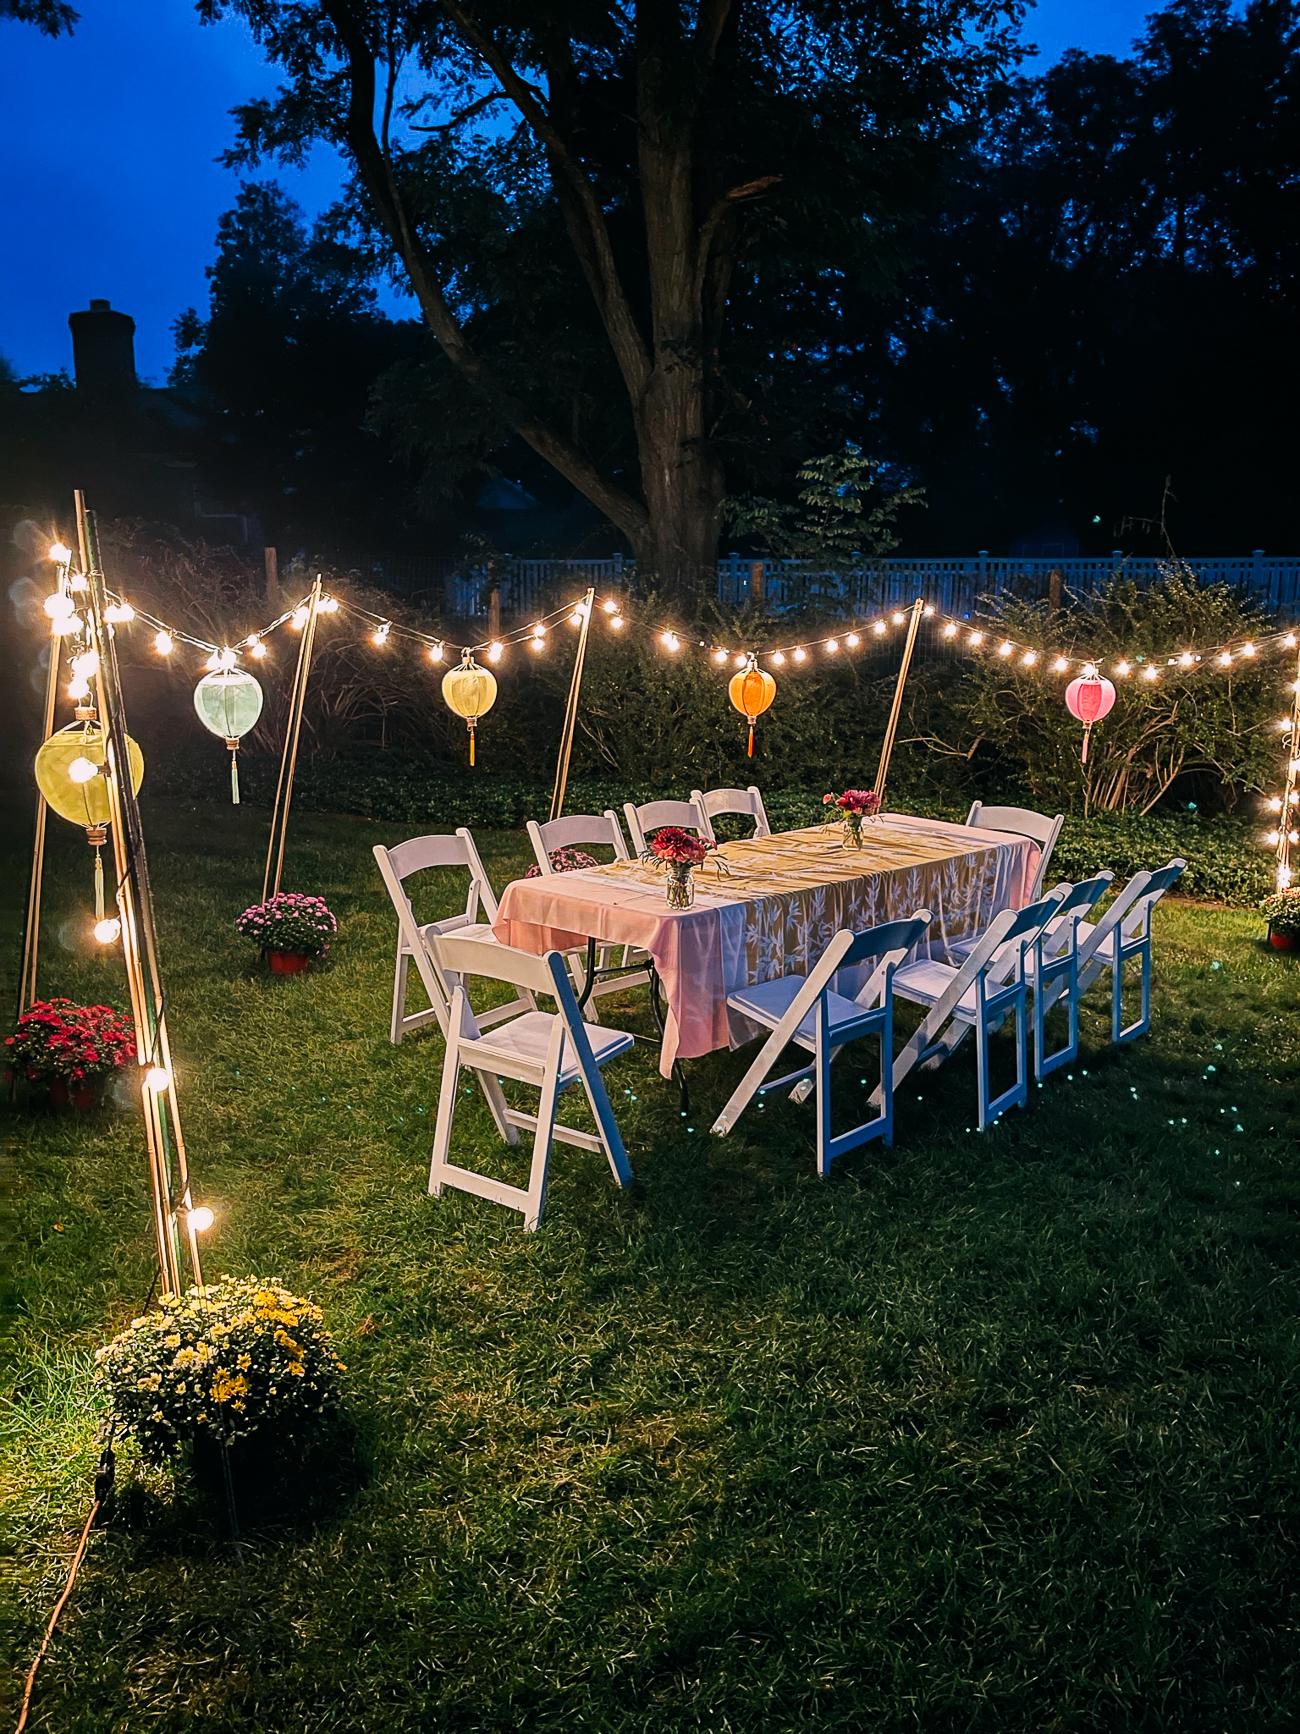 Outdoor Mid-Autumn Festival Table